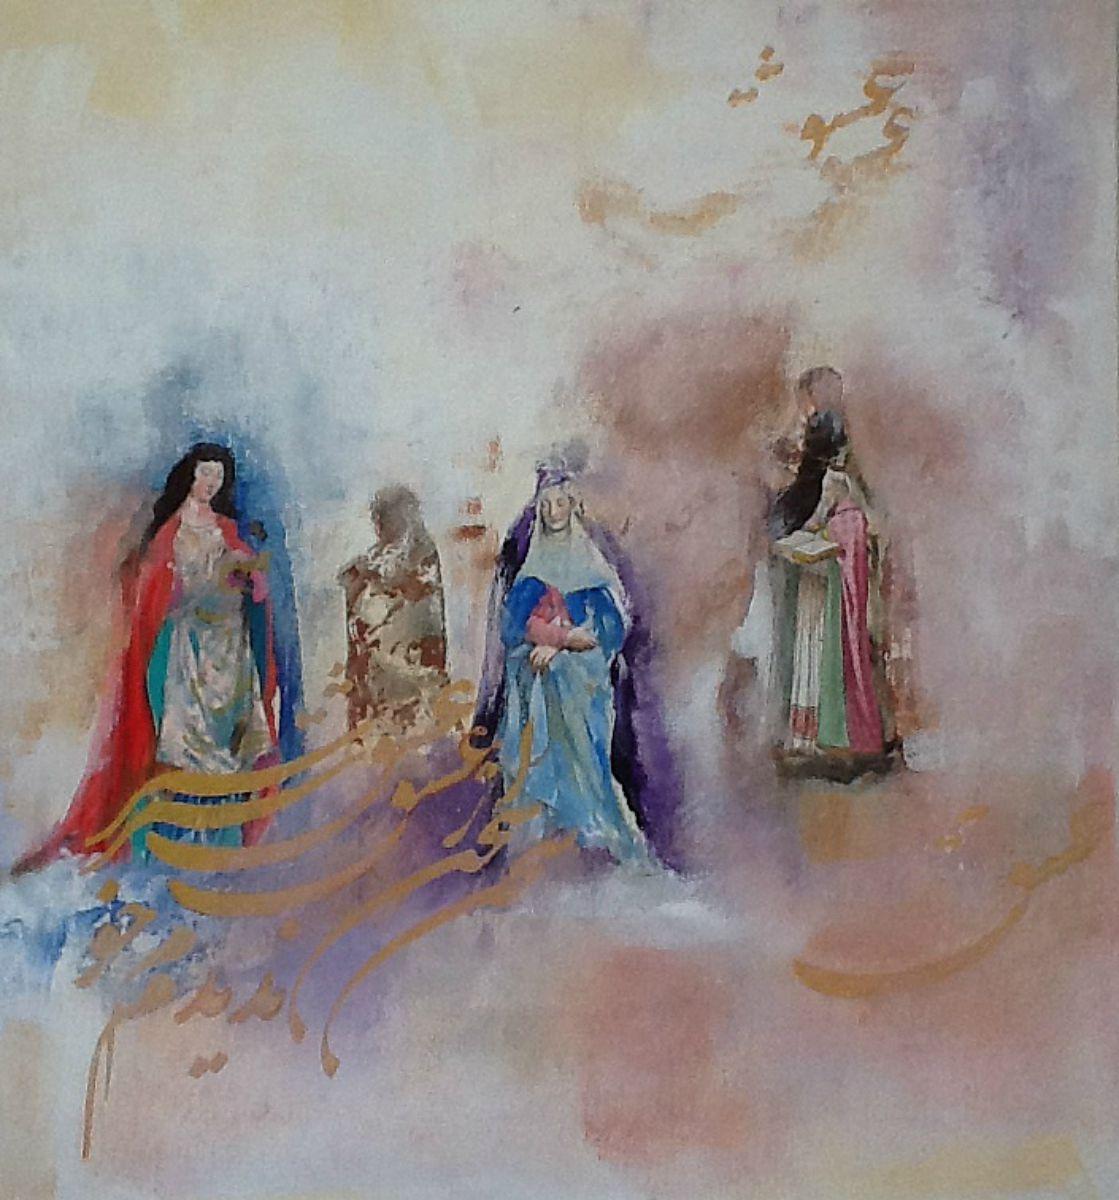 Farzaneh-Farid-Moayer-image